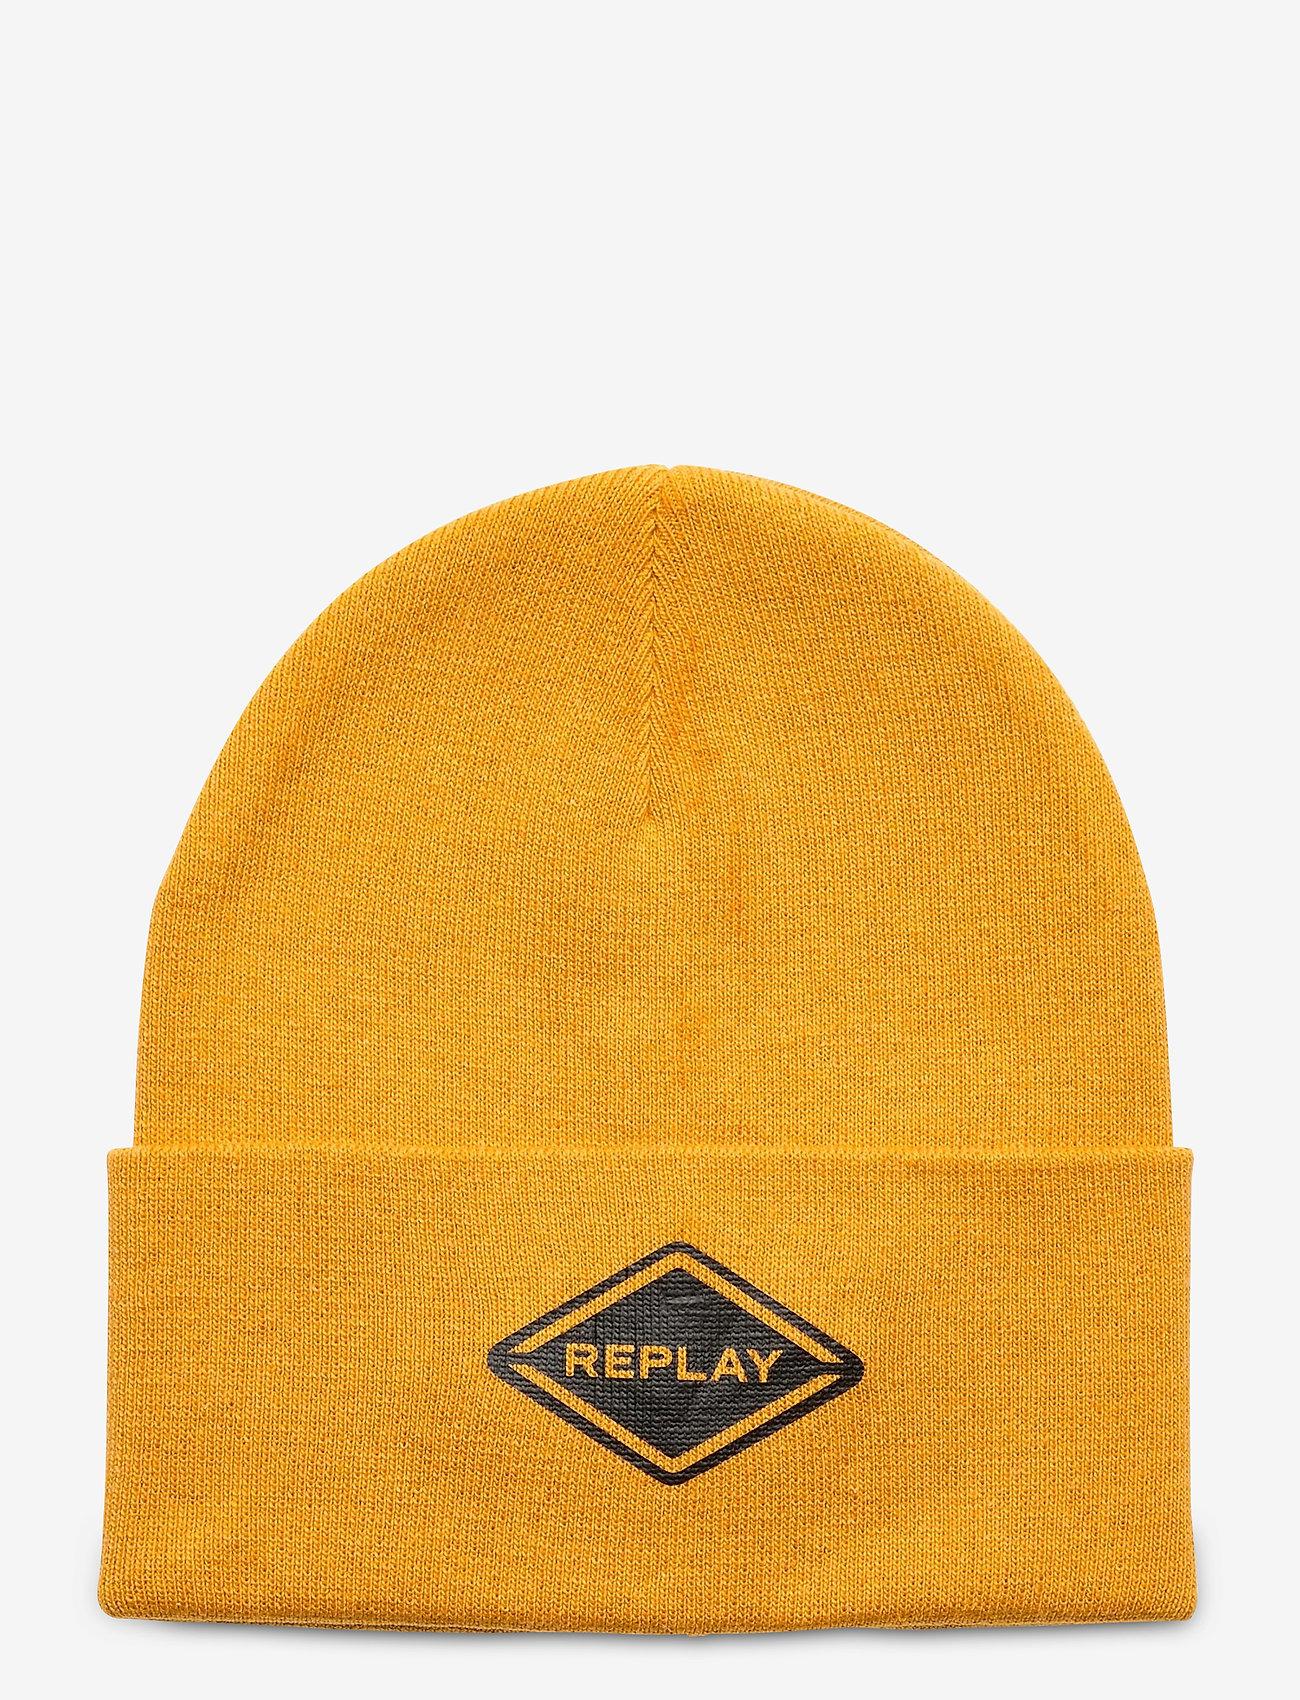 Replay - Cap - chapeaux - dk yellow - 0